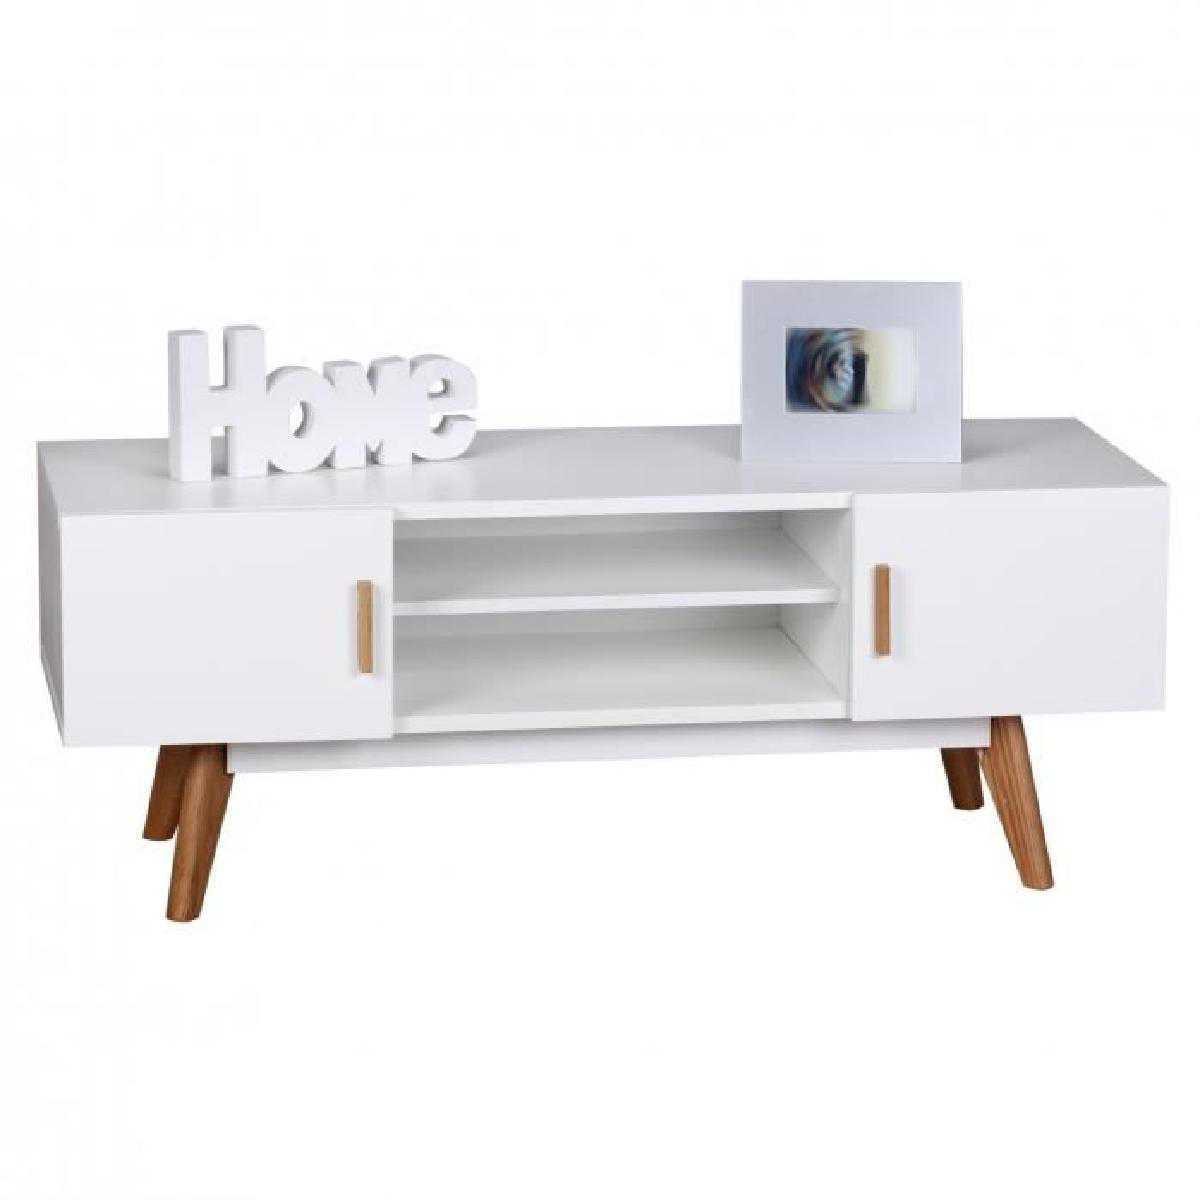 Repeindre un meuble style scandinave